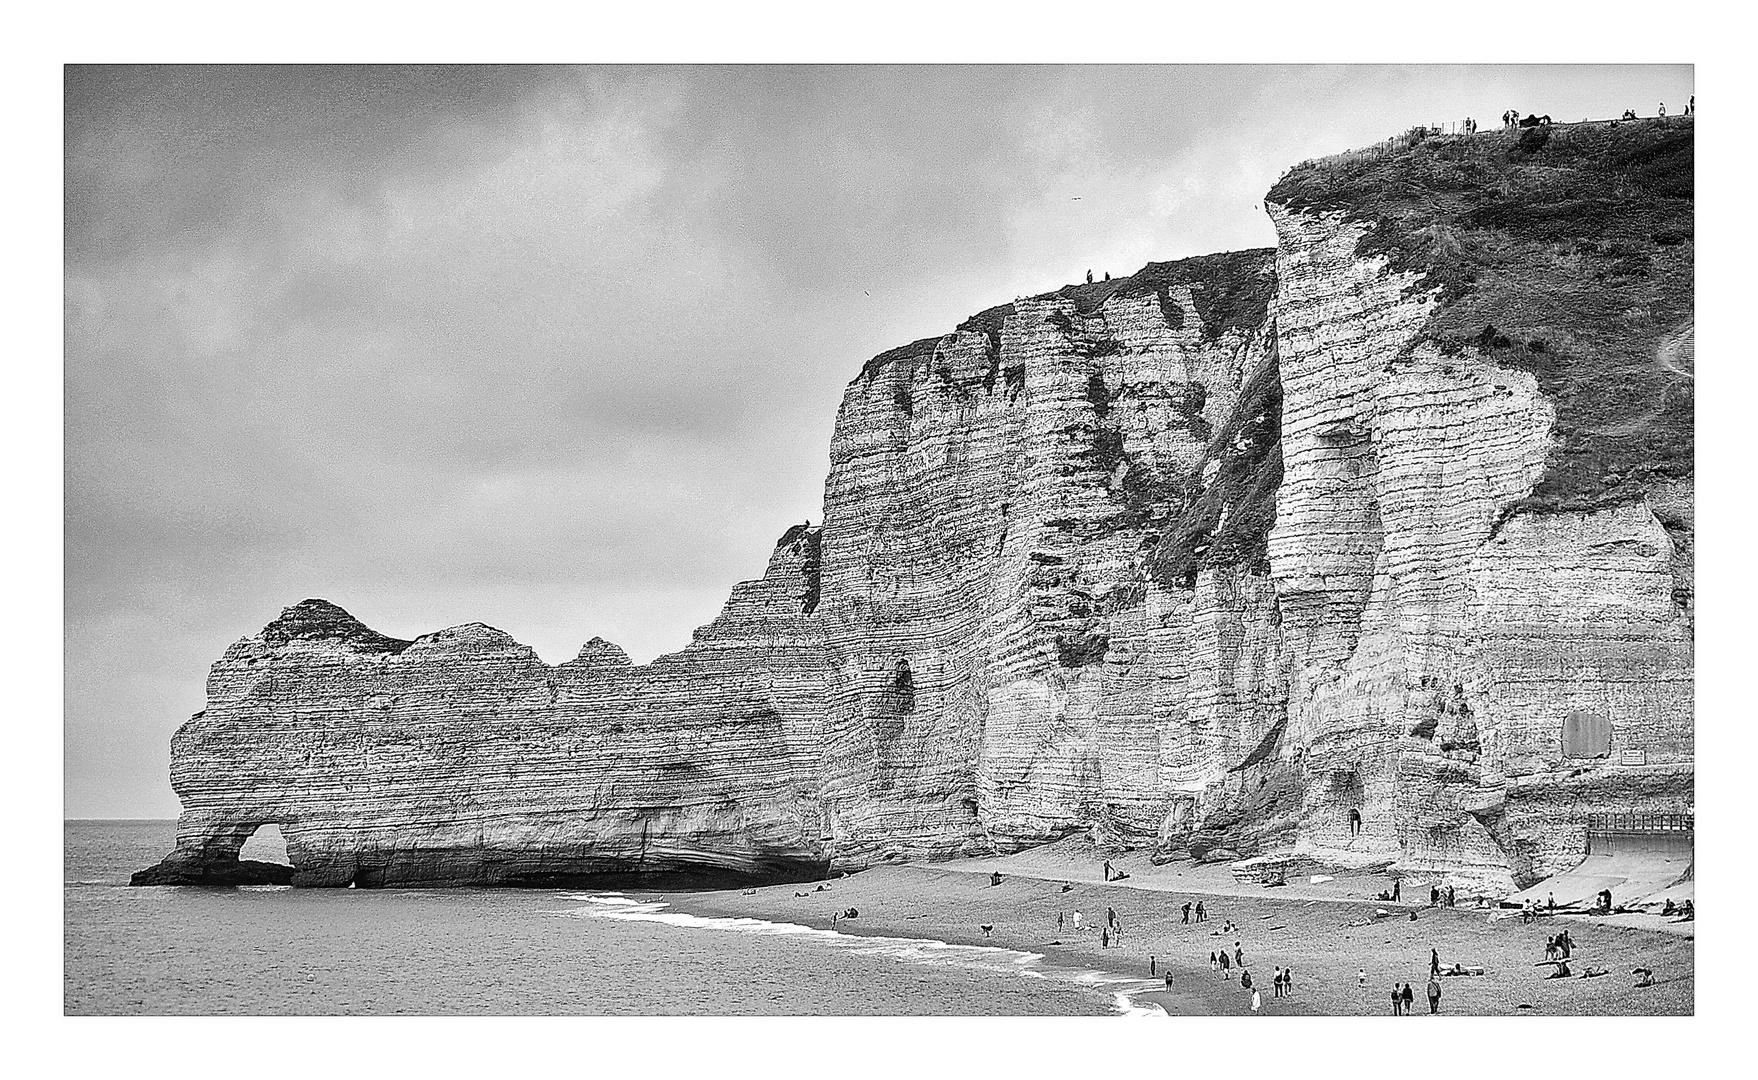 Etretat - Hte Normandie (2)